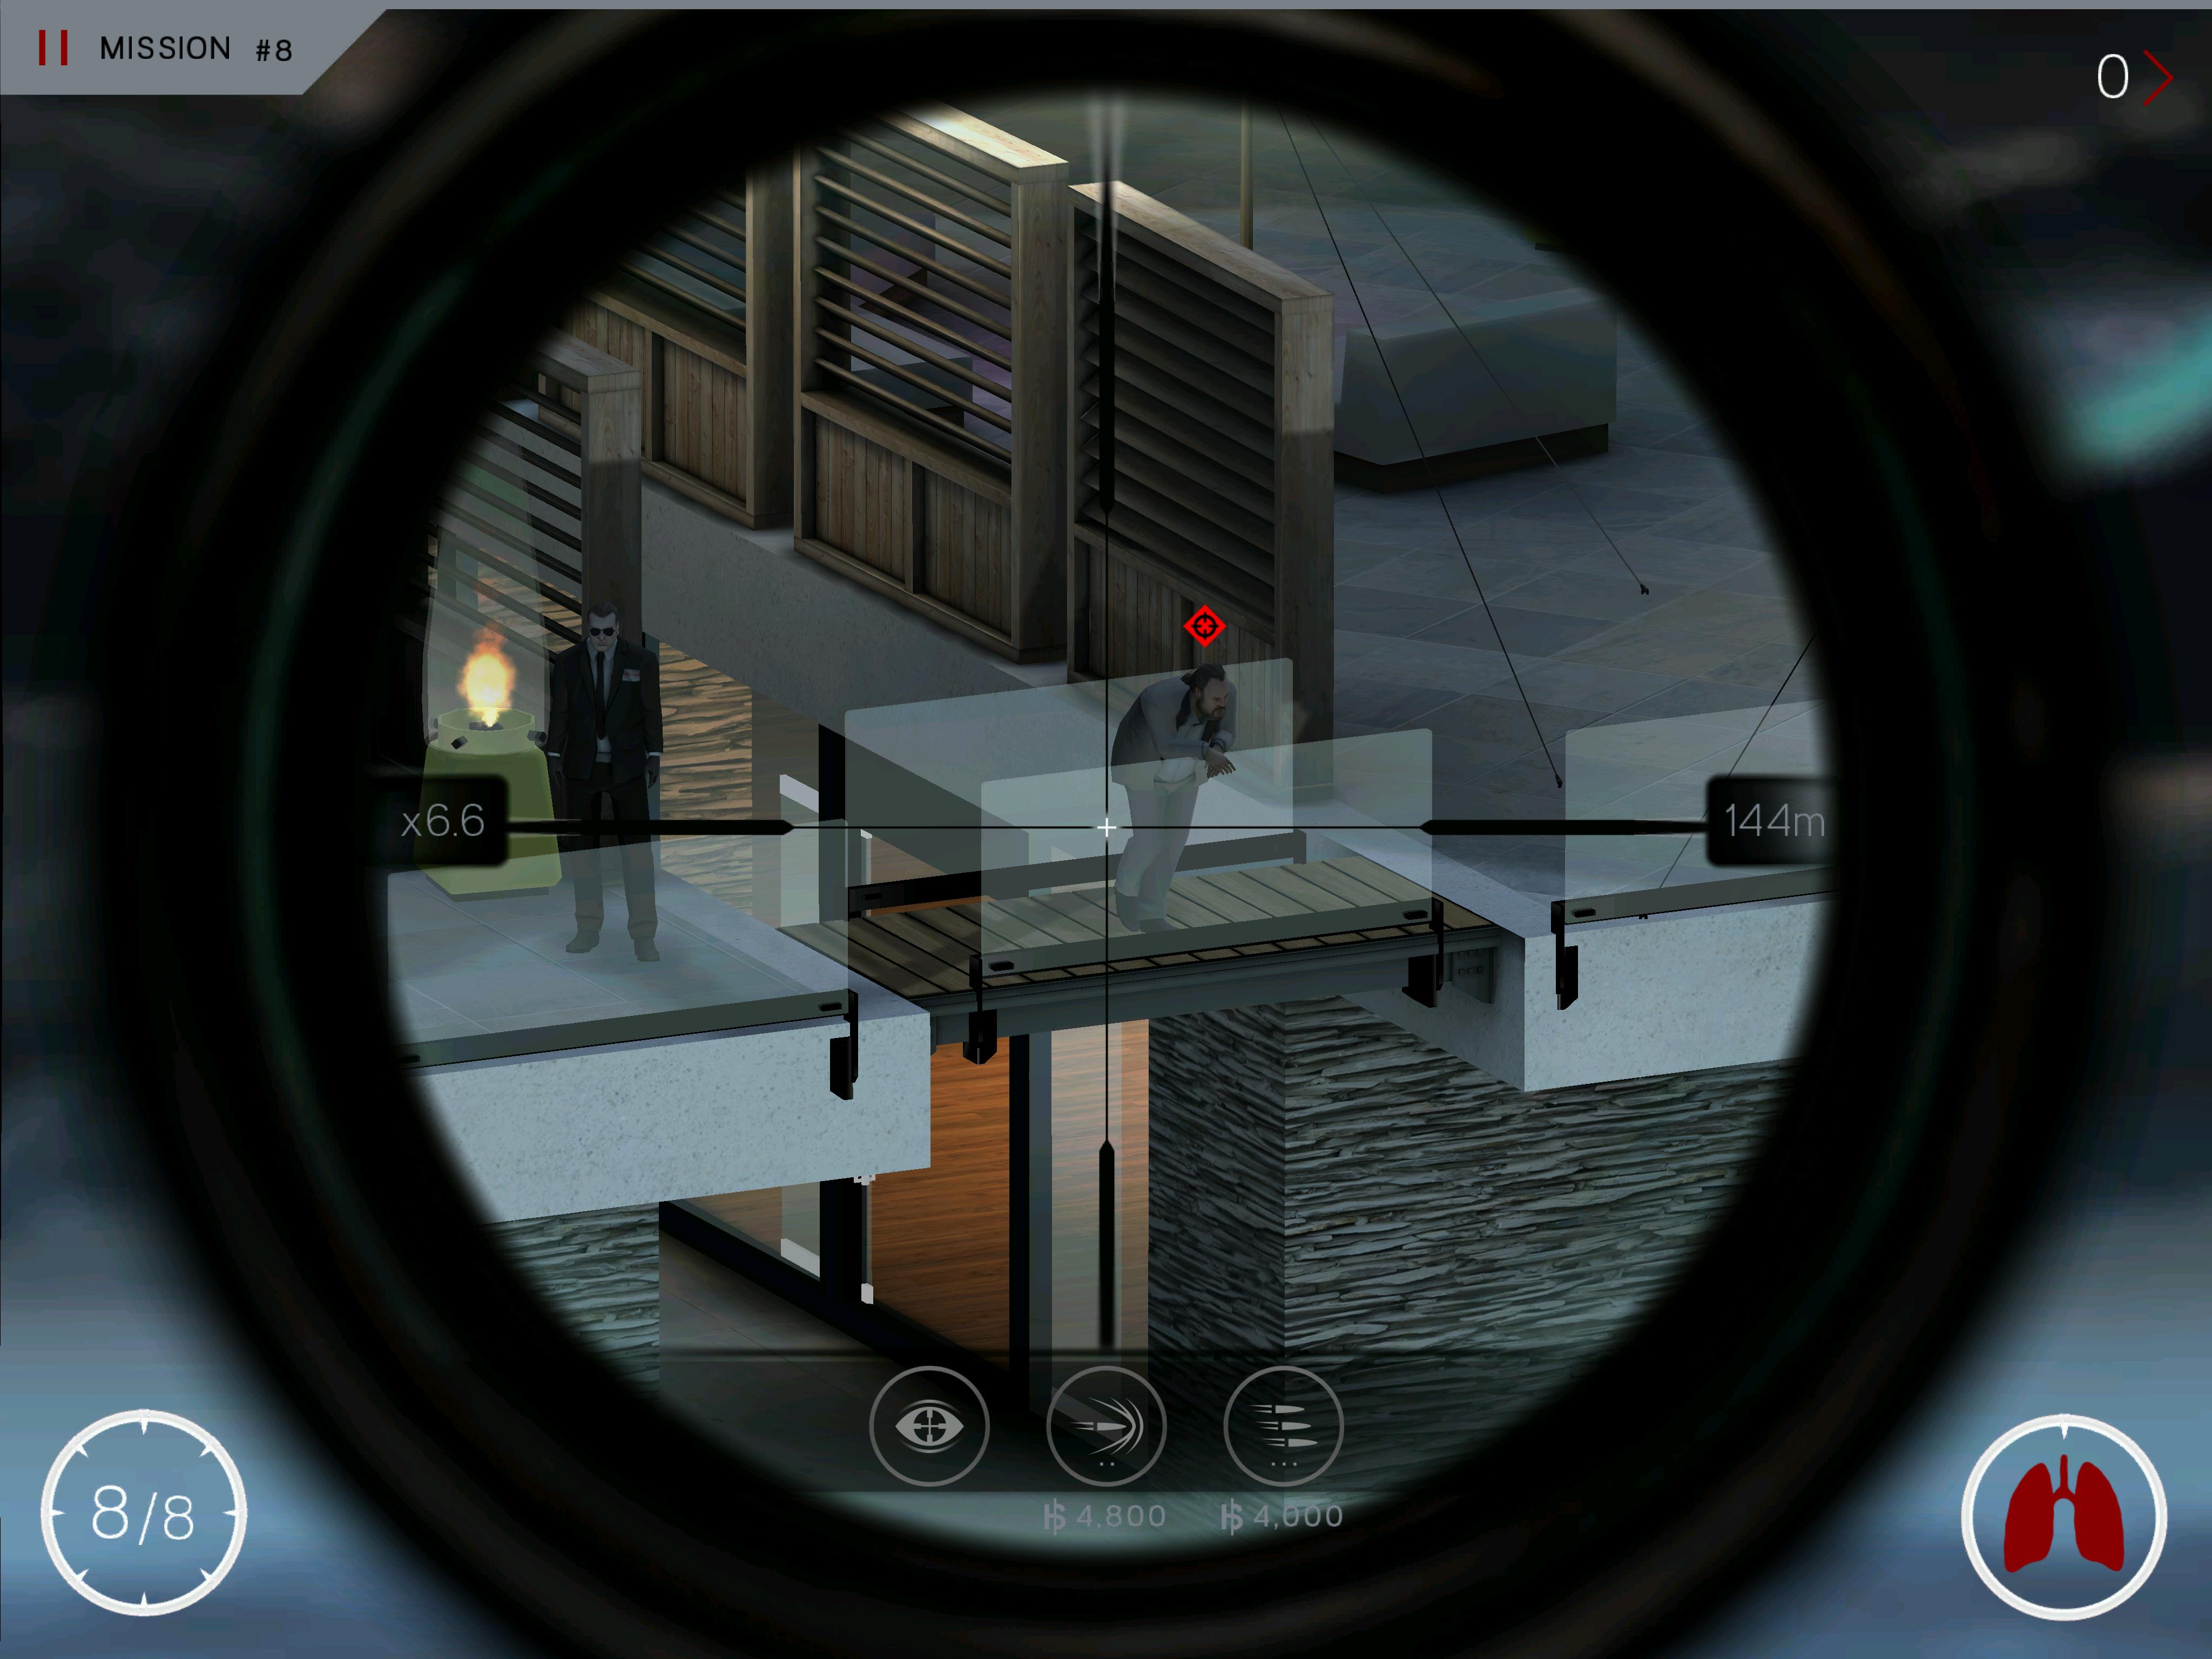 Hitman Sniper Galaxy S6 Gameplay - Fliptroniks.com